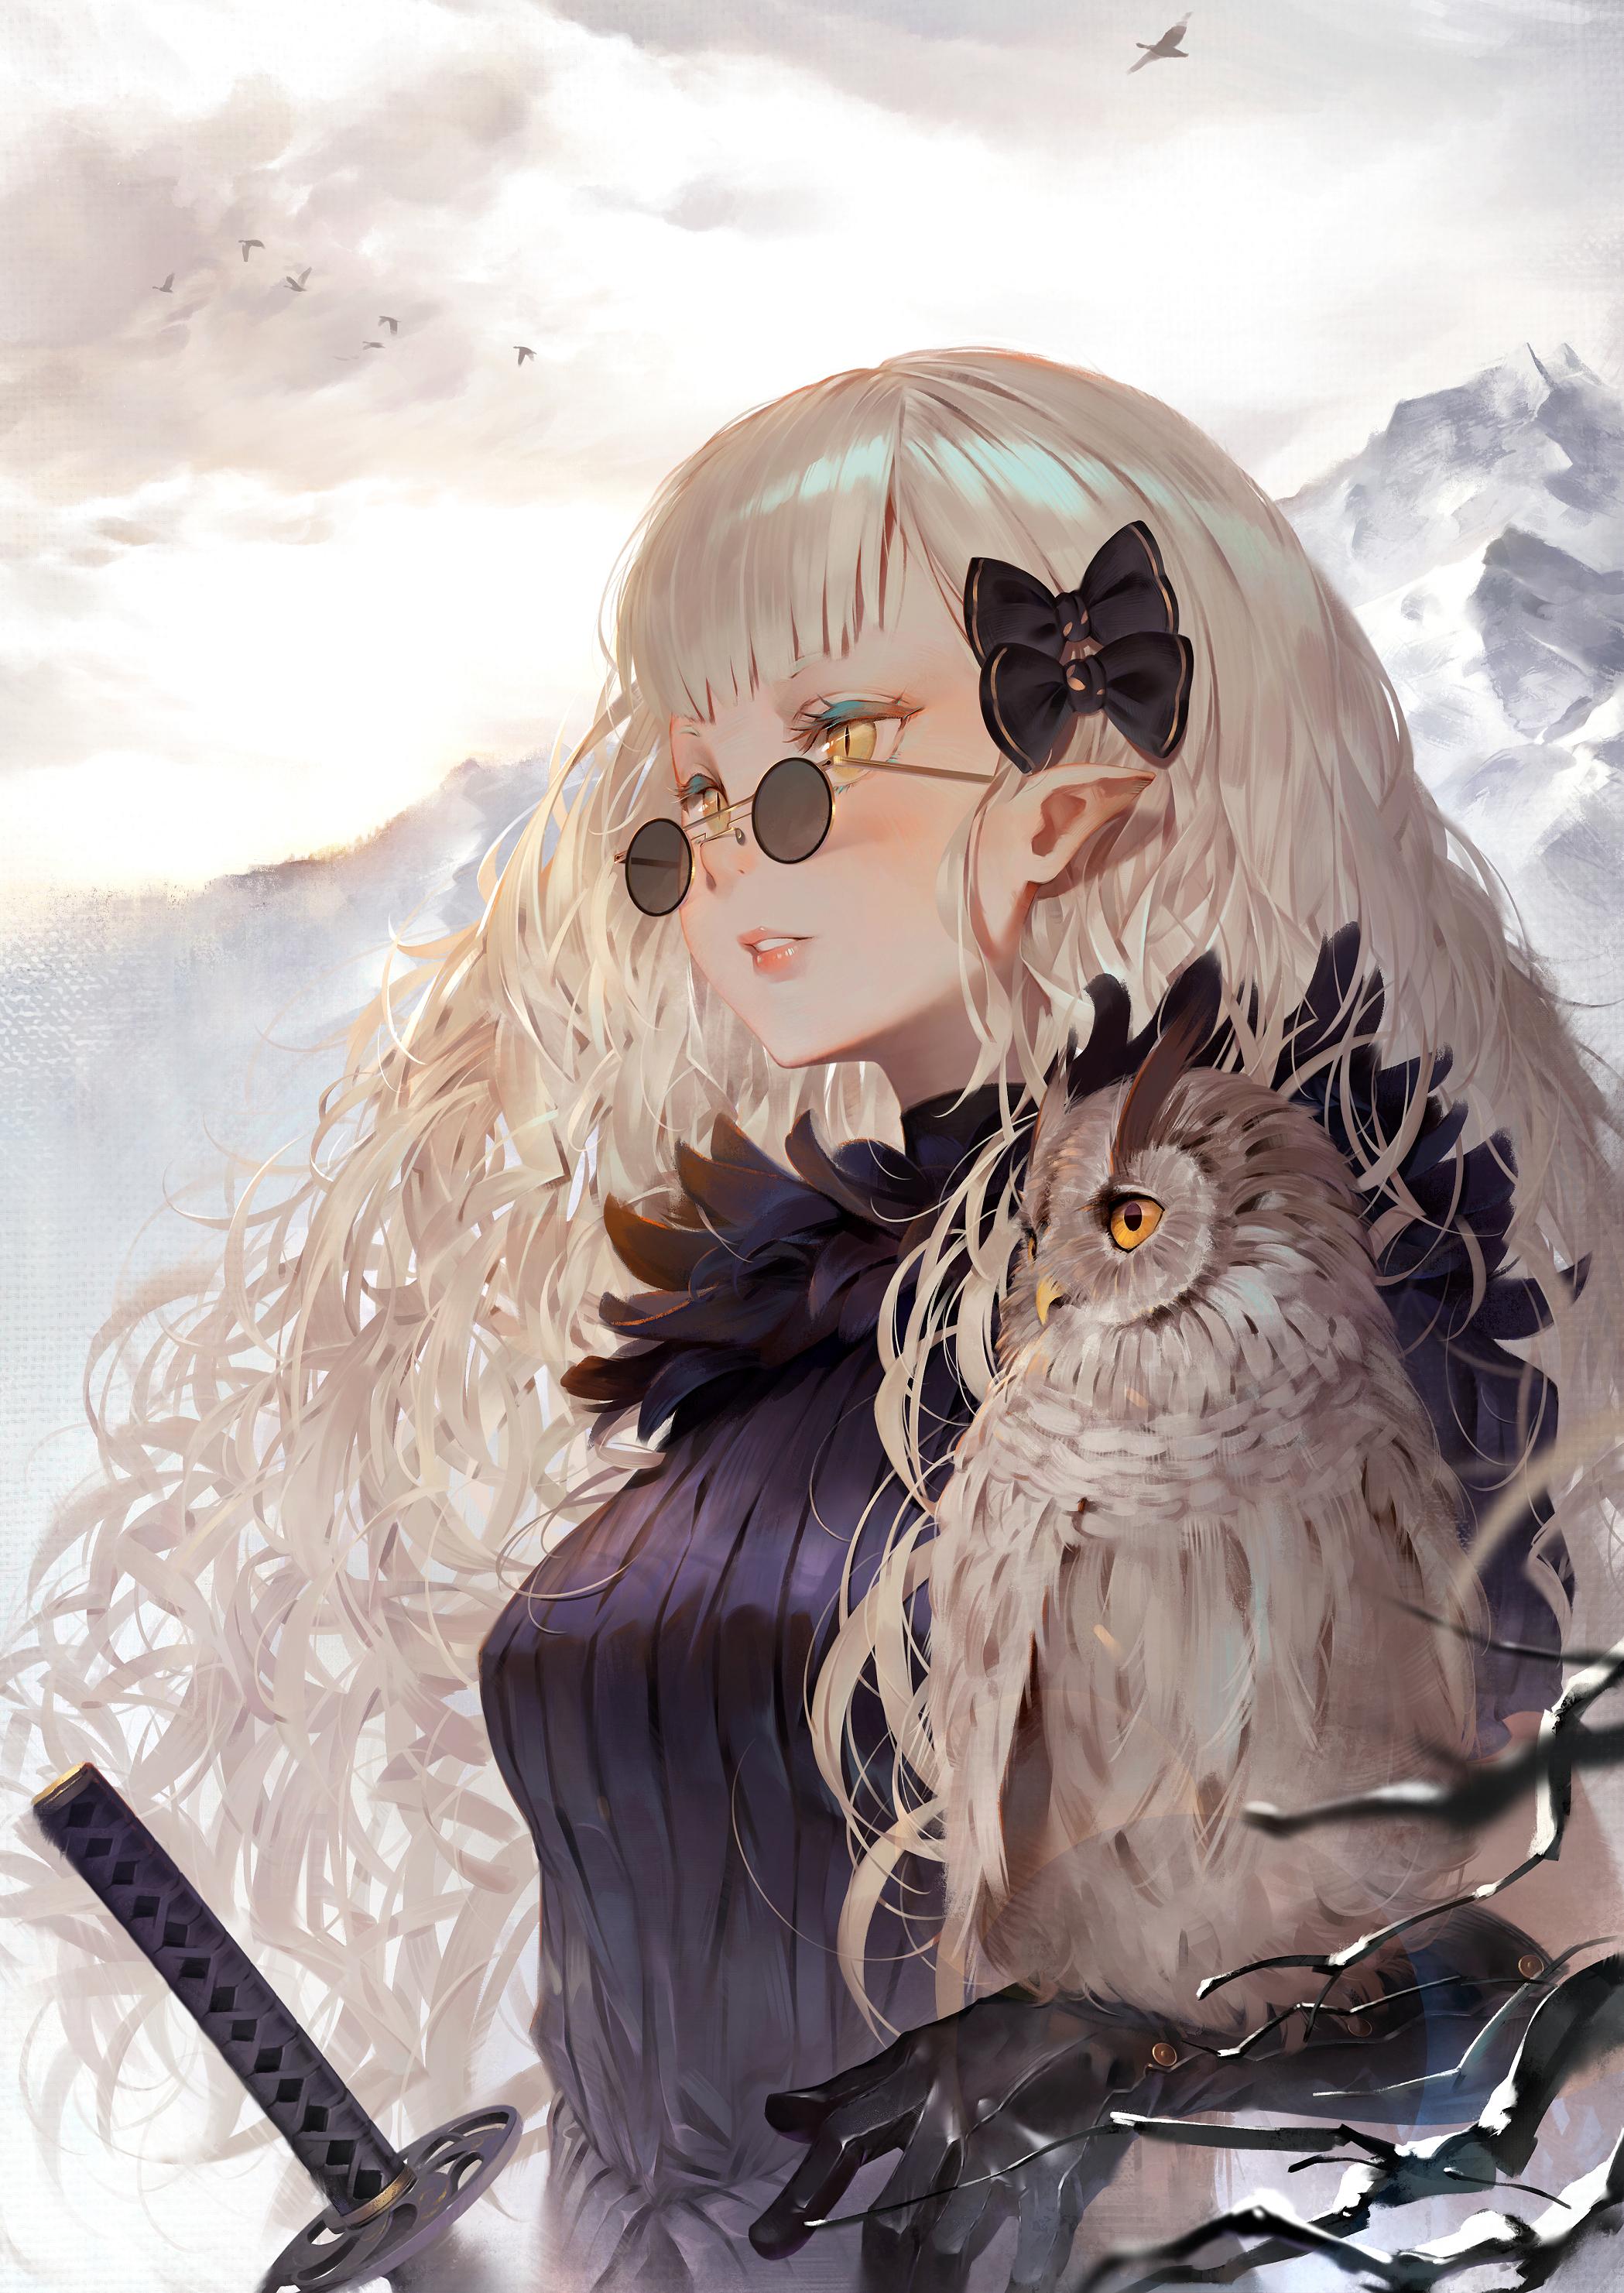 Wallpaper Anime Girls Mountains Sword Katana Gloves Owl